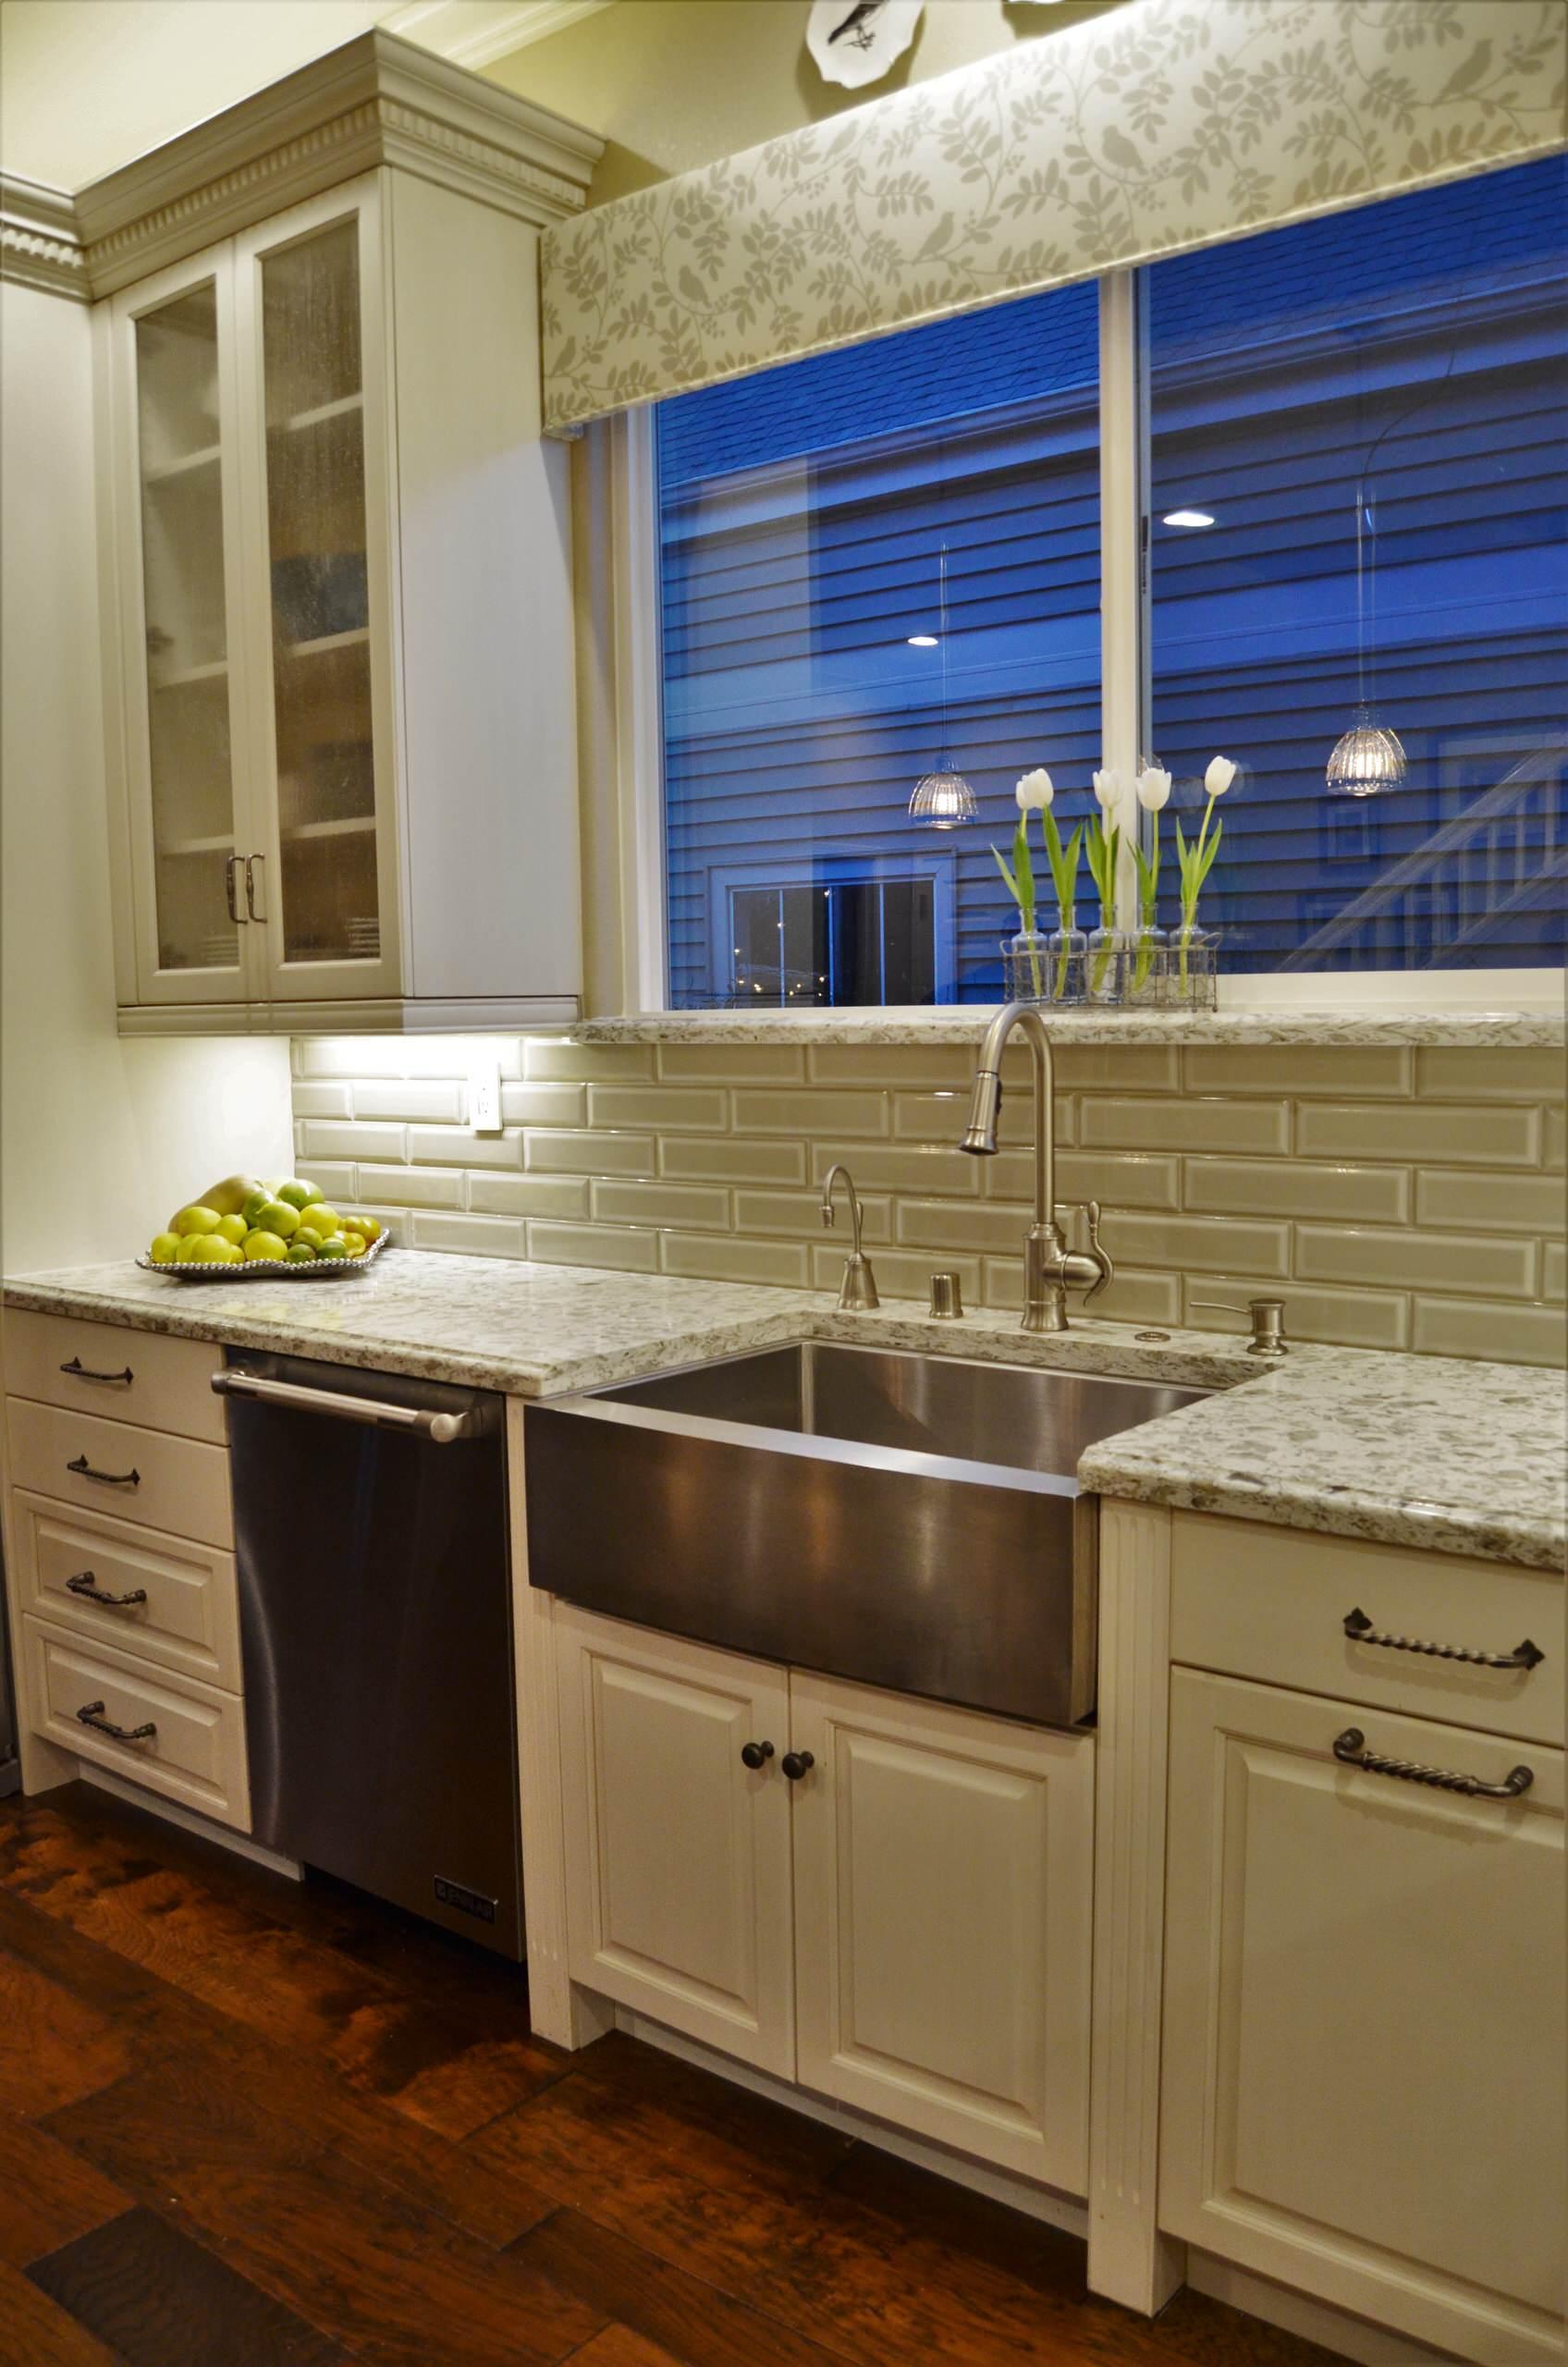 Picture Perfect Petaluma Kitchen